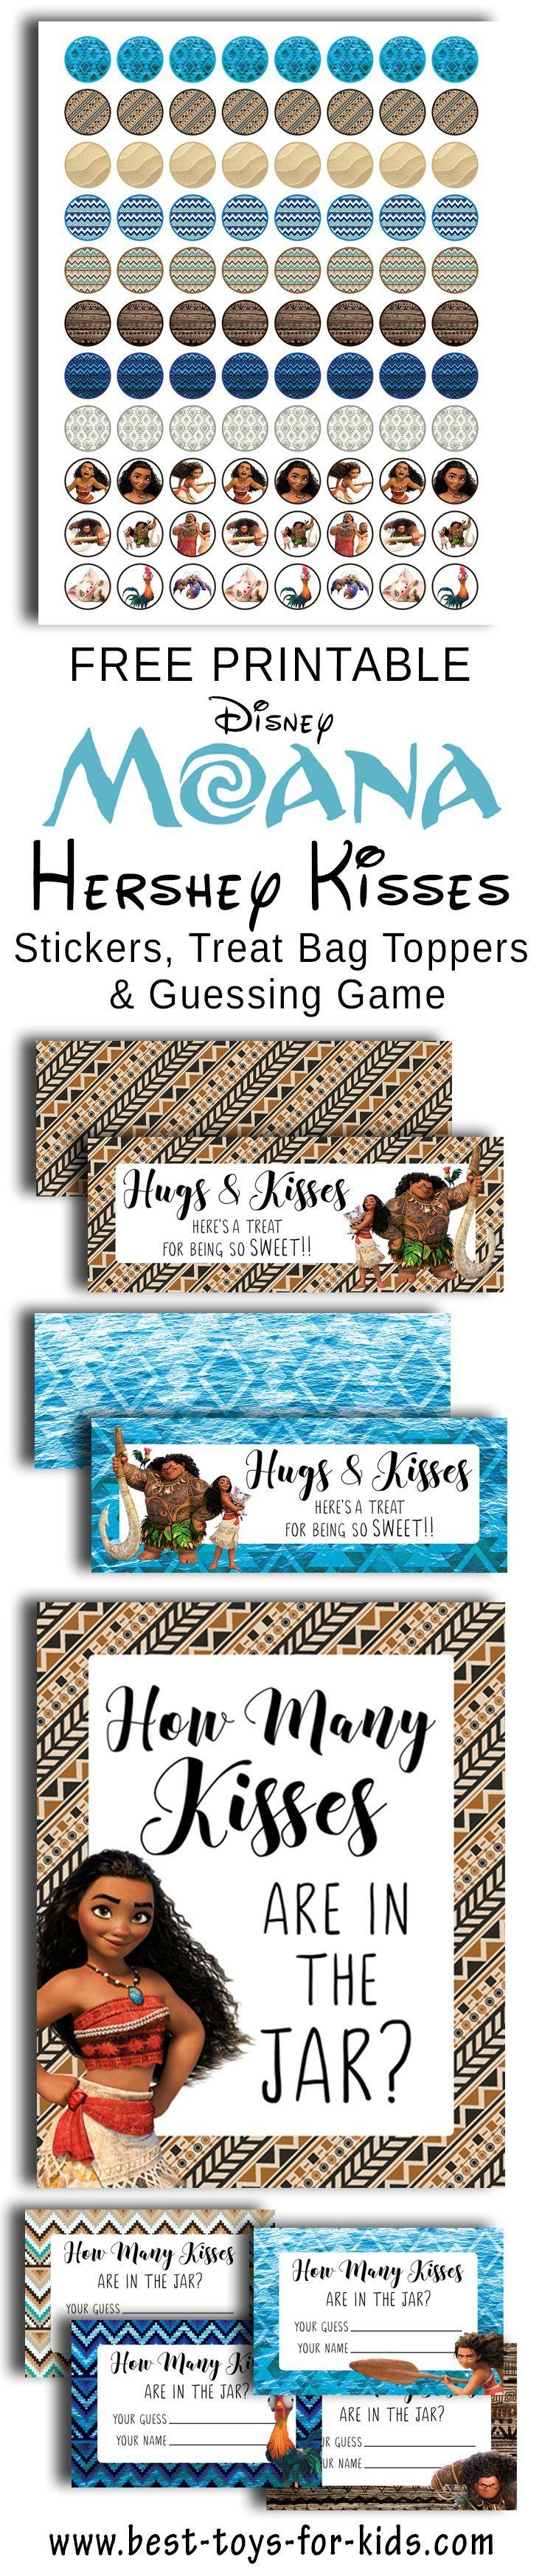 Disney moana free printable hershey kiss stickers treat bag toppers